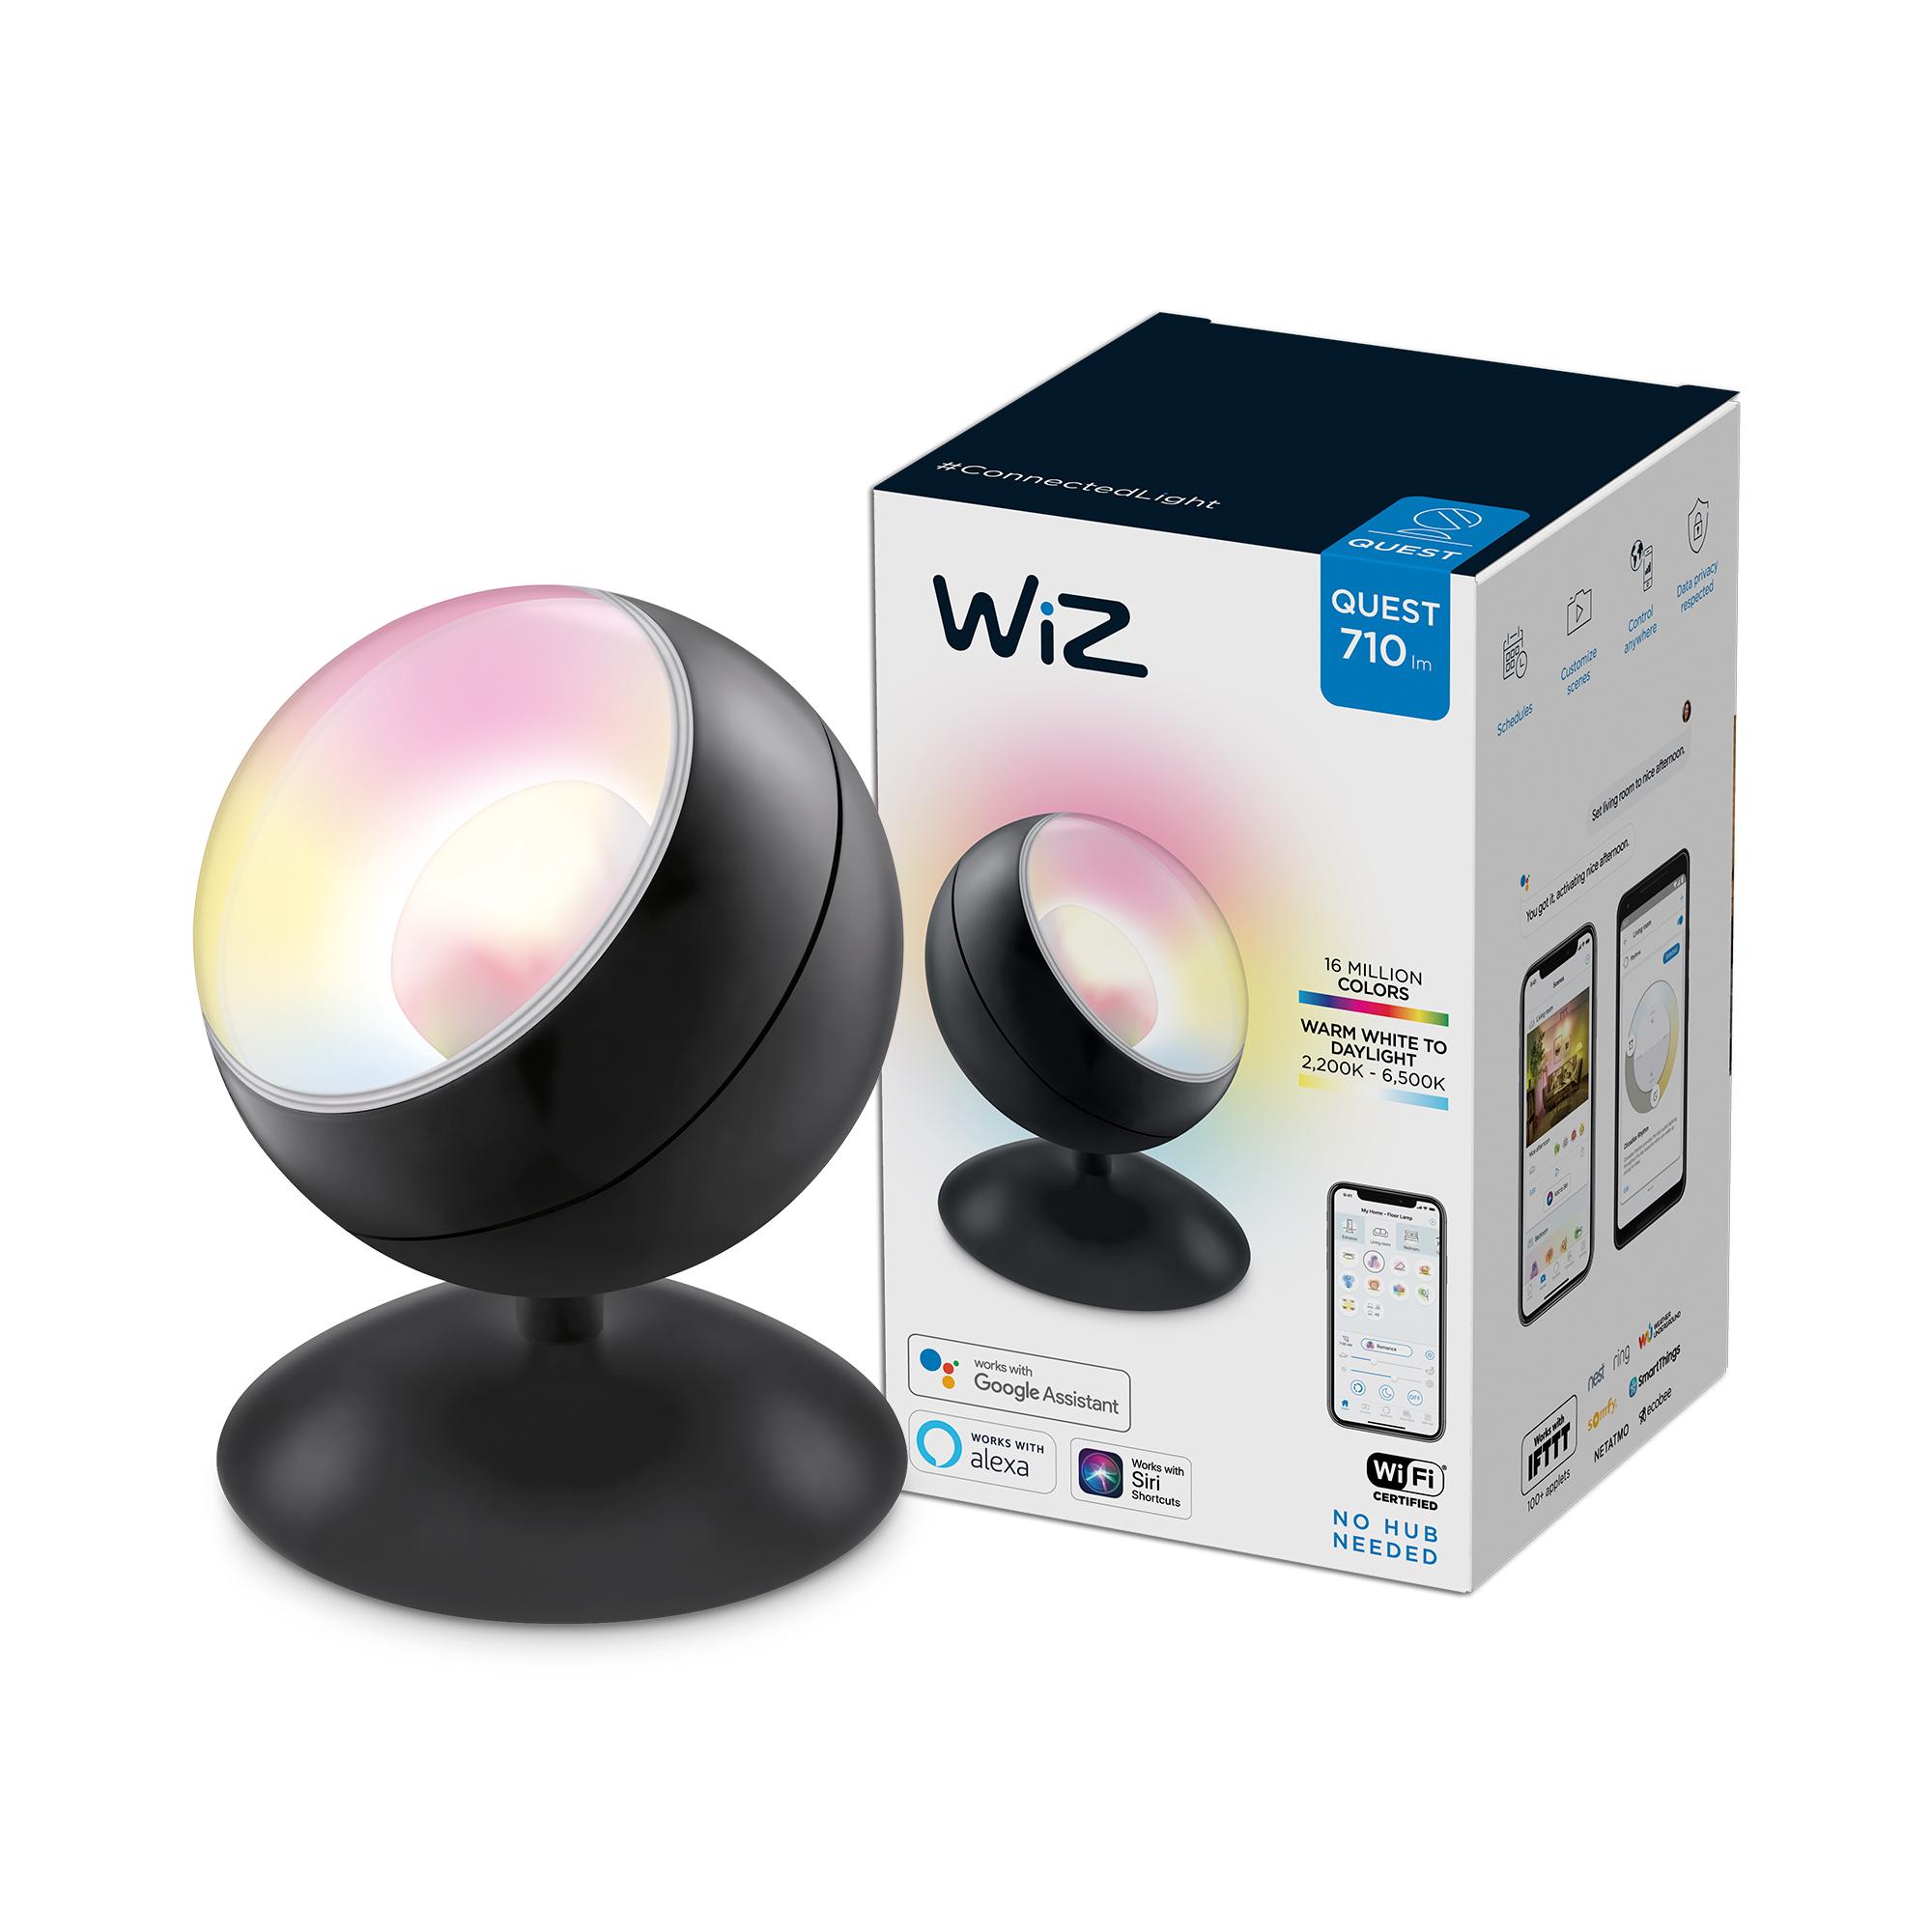 WiZ -Wi-Fi Portable Quest black